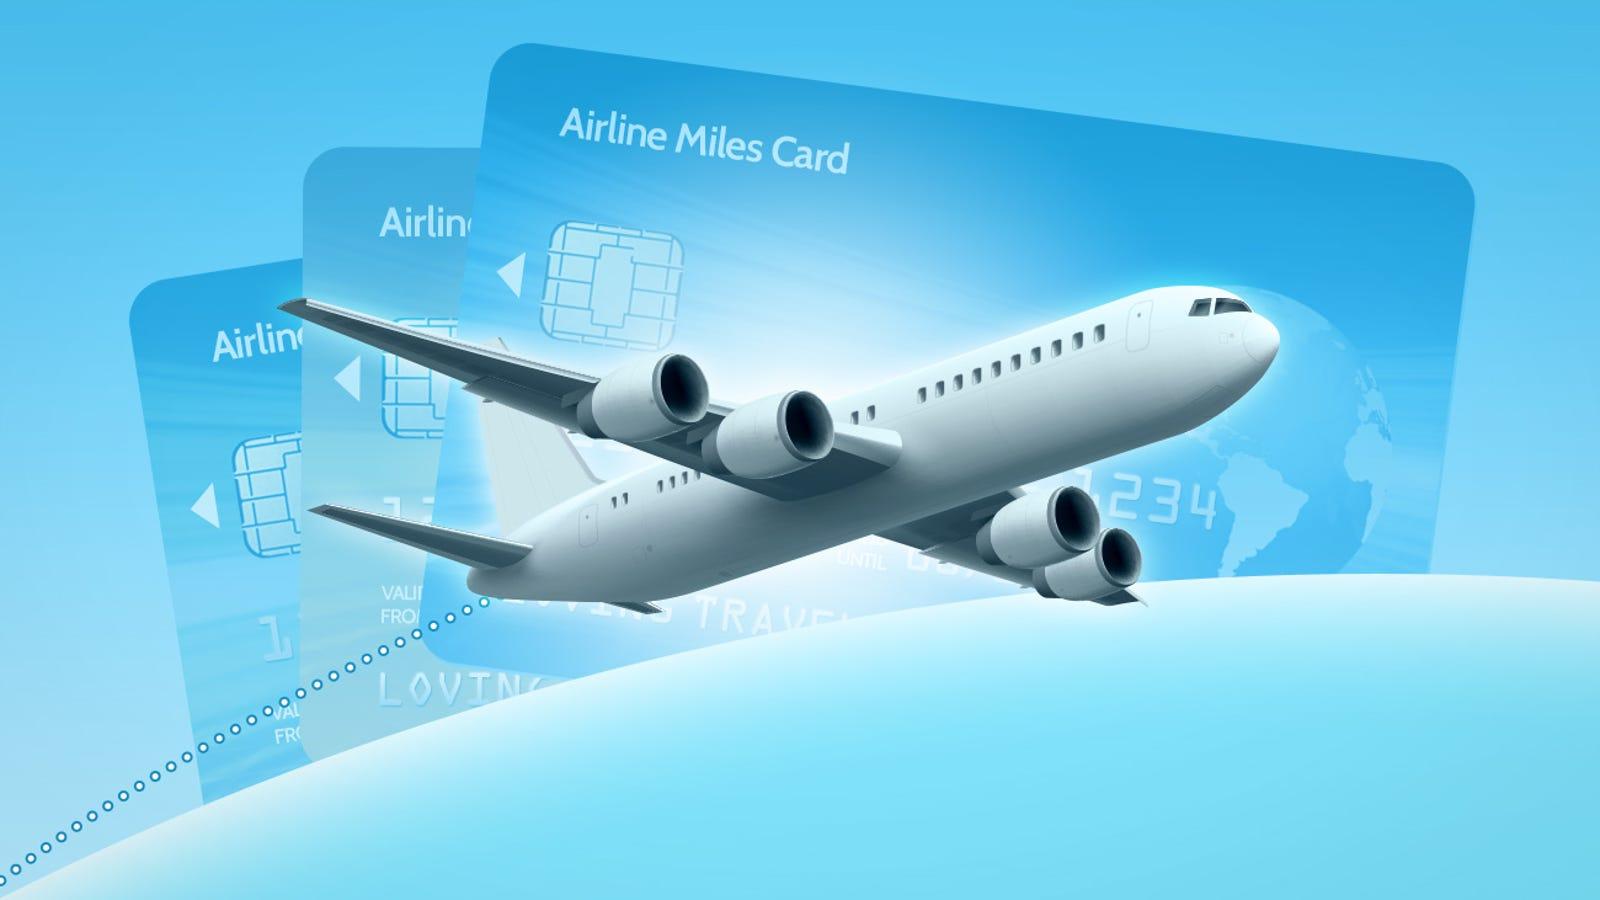 beginner guide too air miles hacking